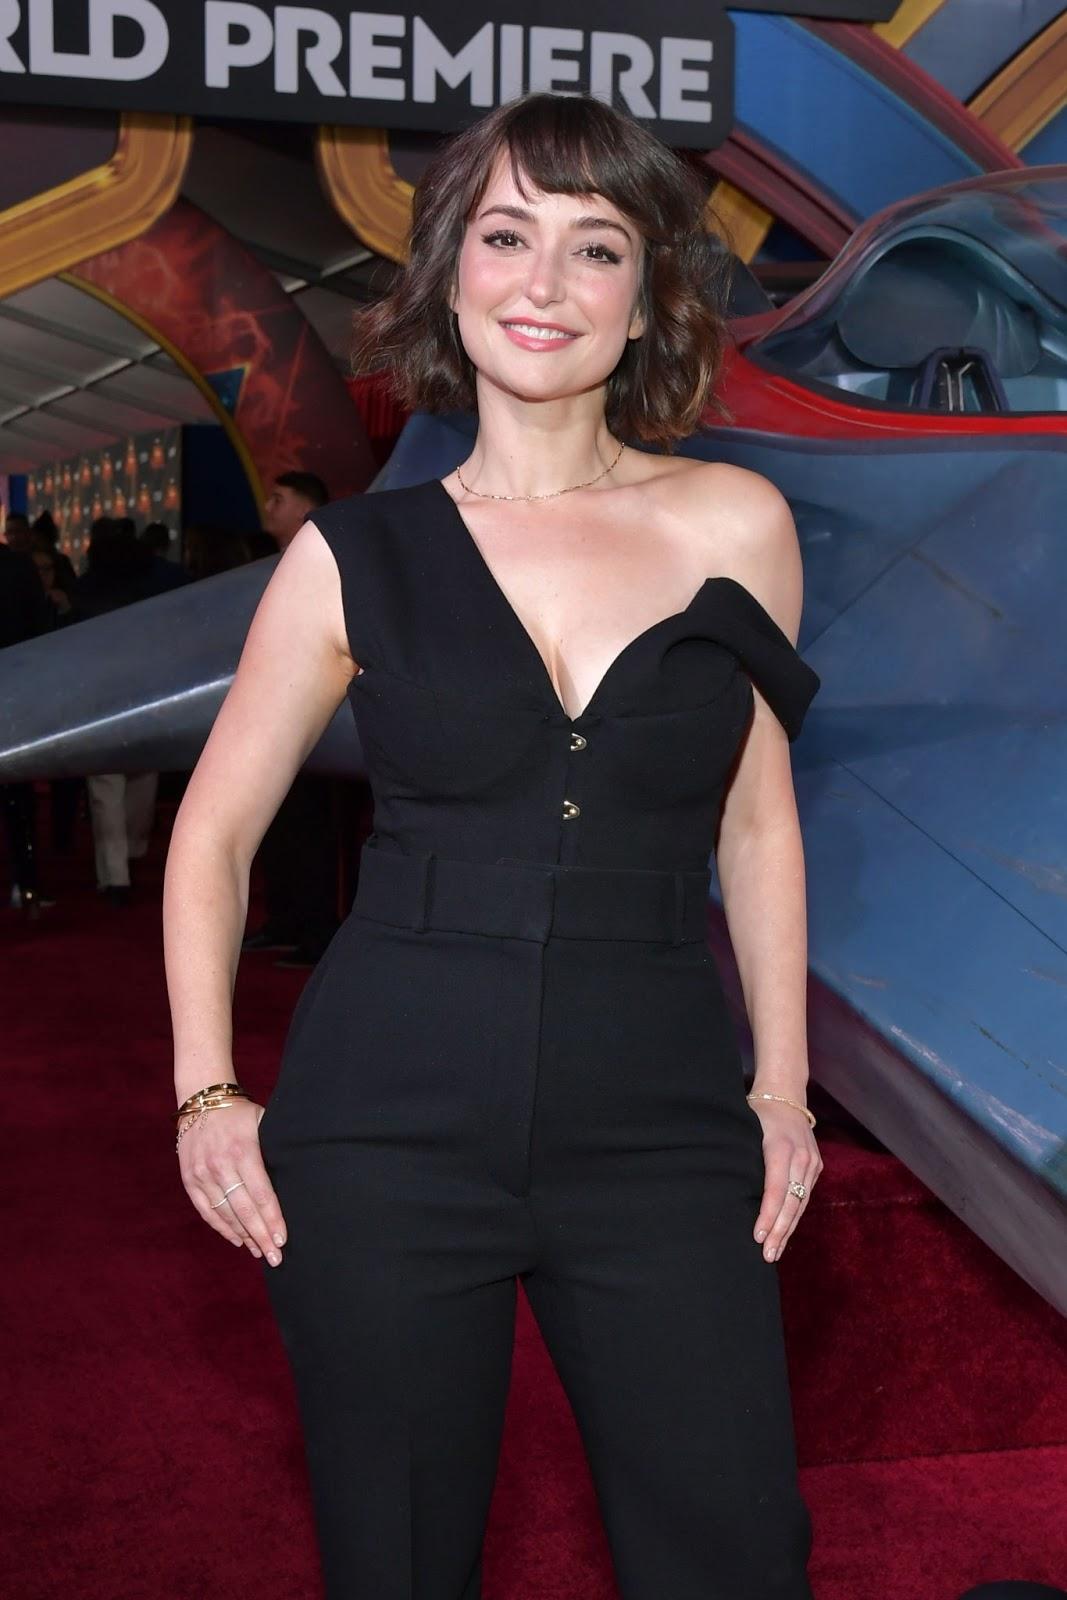 Milana Vayntrub at the Captain Marvel Premiere in Hollywood, CA - 03/04/2019